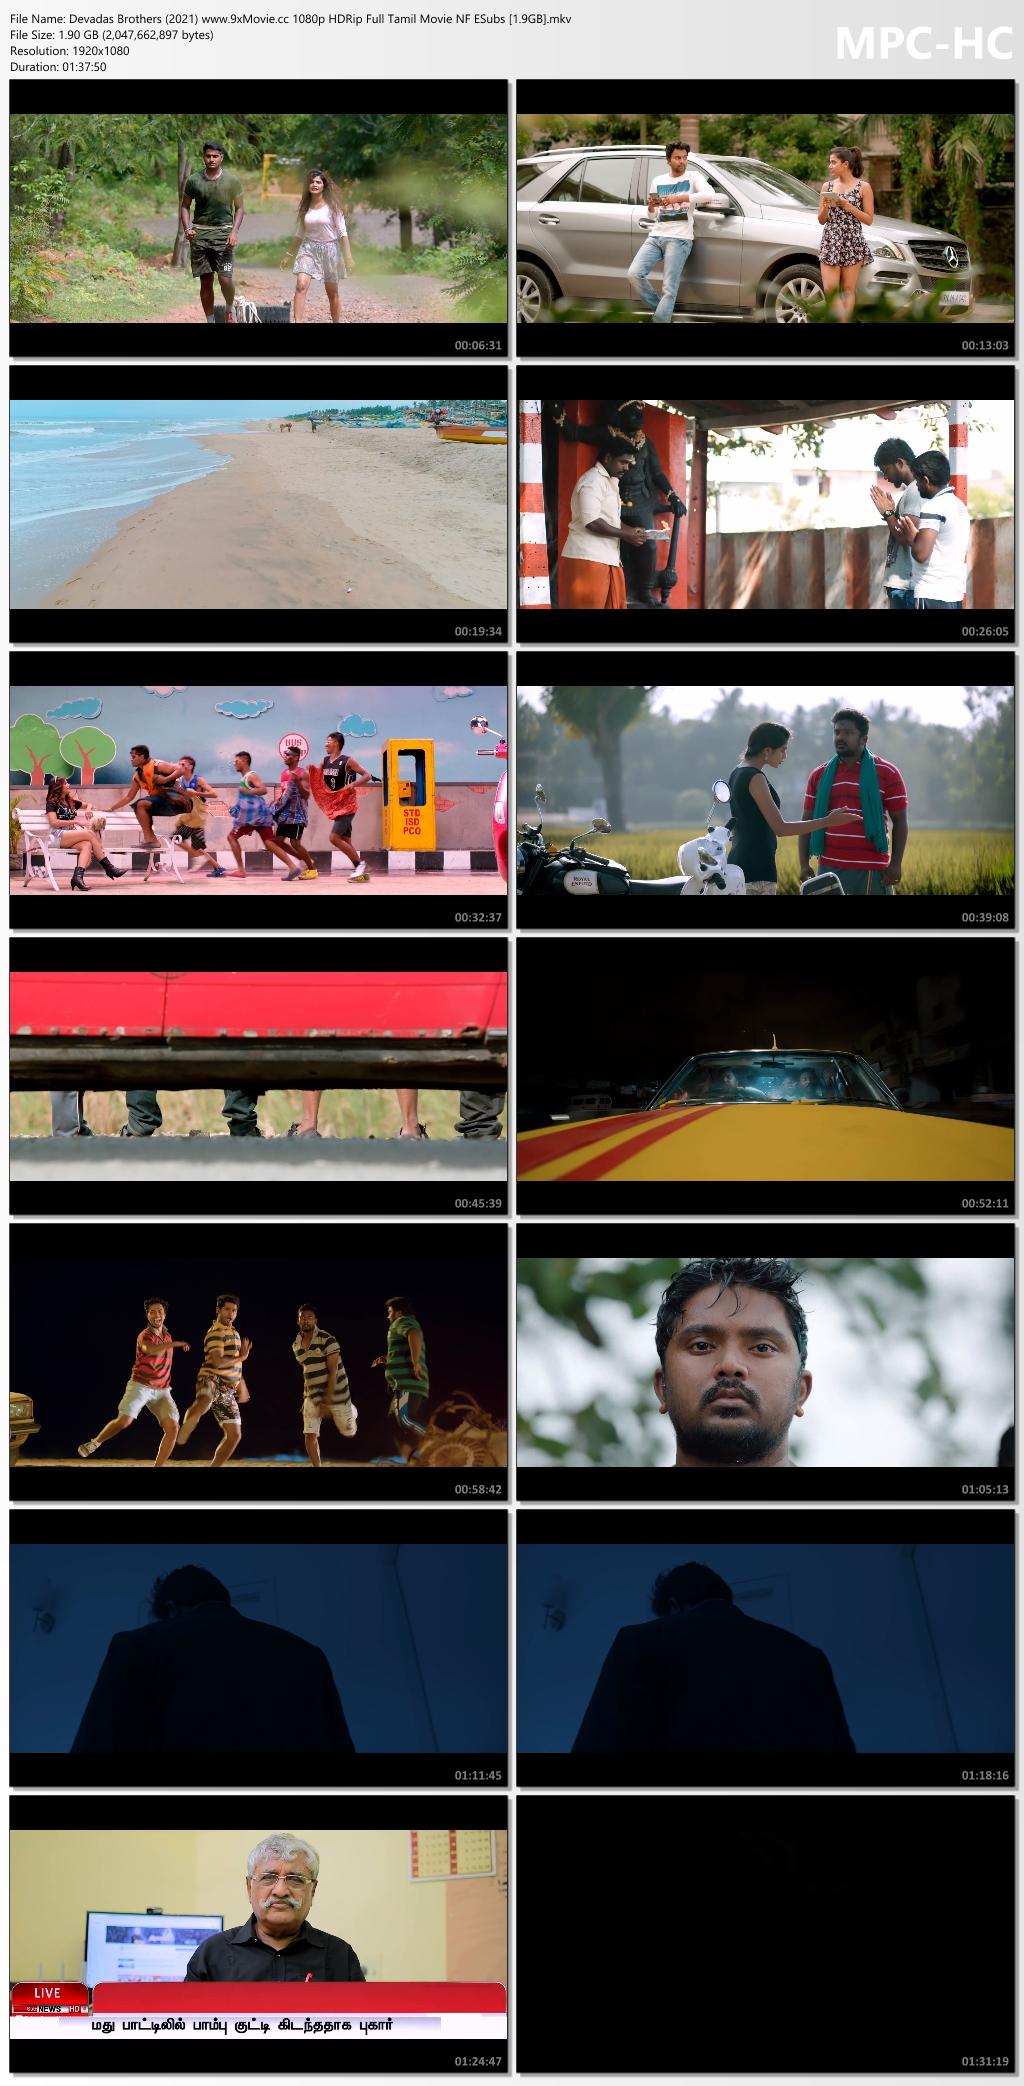 Devadas-Brothers-2021-www-9x-Movie-cc-1080p-HDRip-Full-Tamil-Movie-NF-ESubs-1-9-GB-mkv